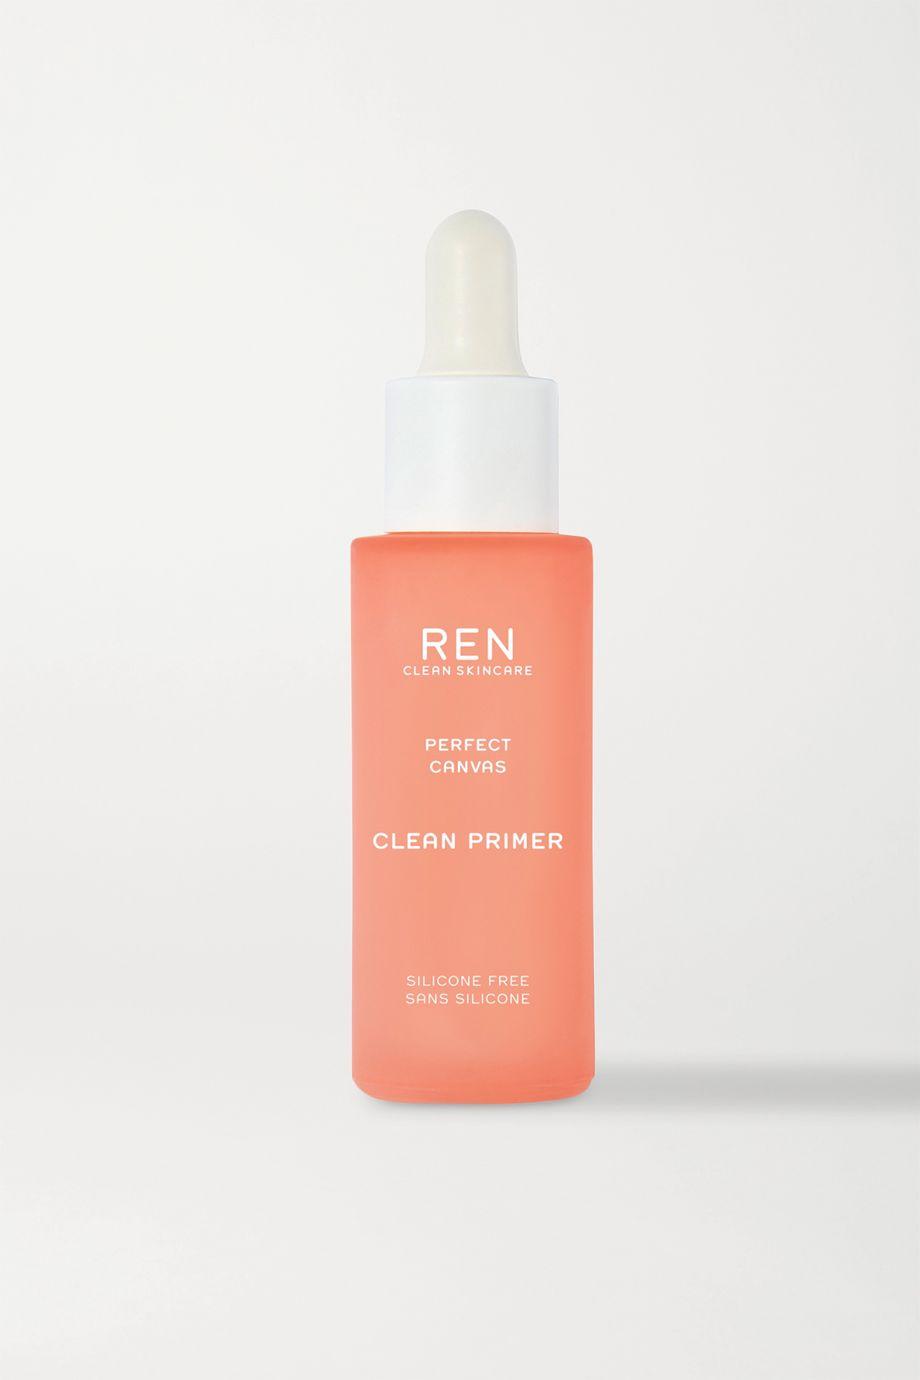 REN Clean Skincare Perfect Canvas Serum, 30ml